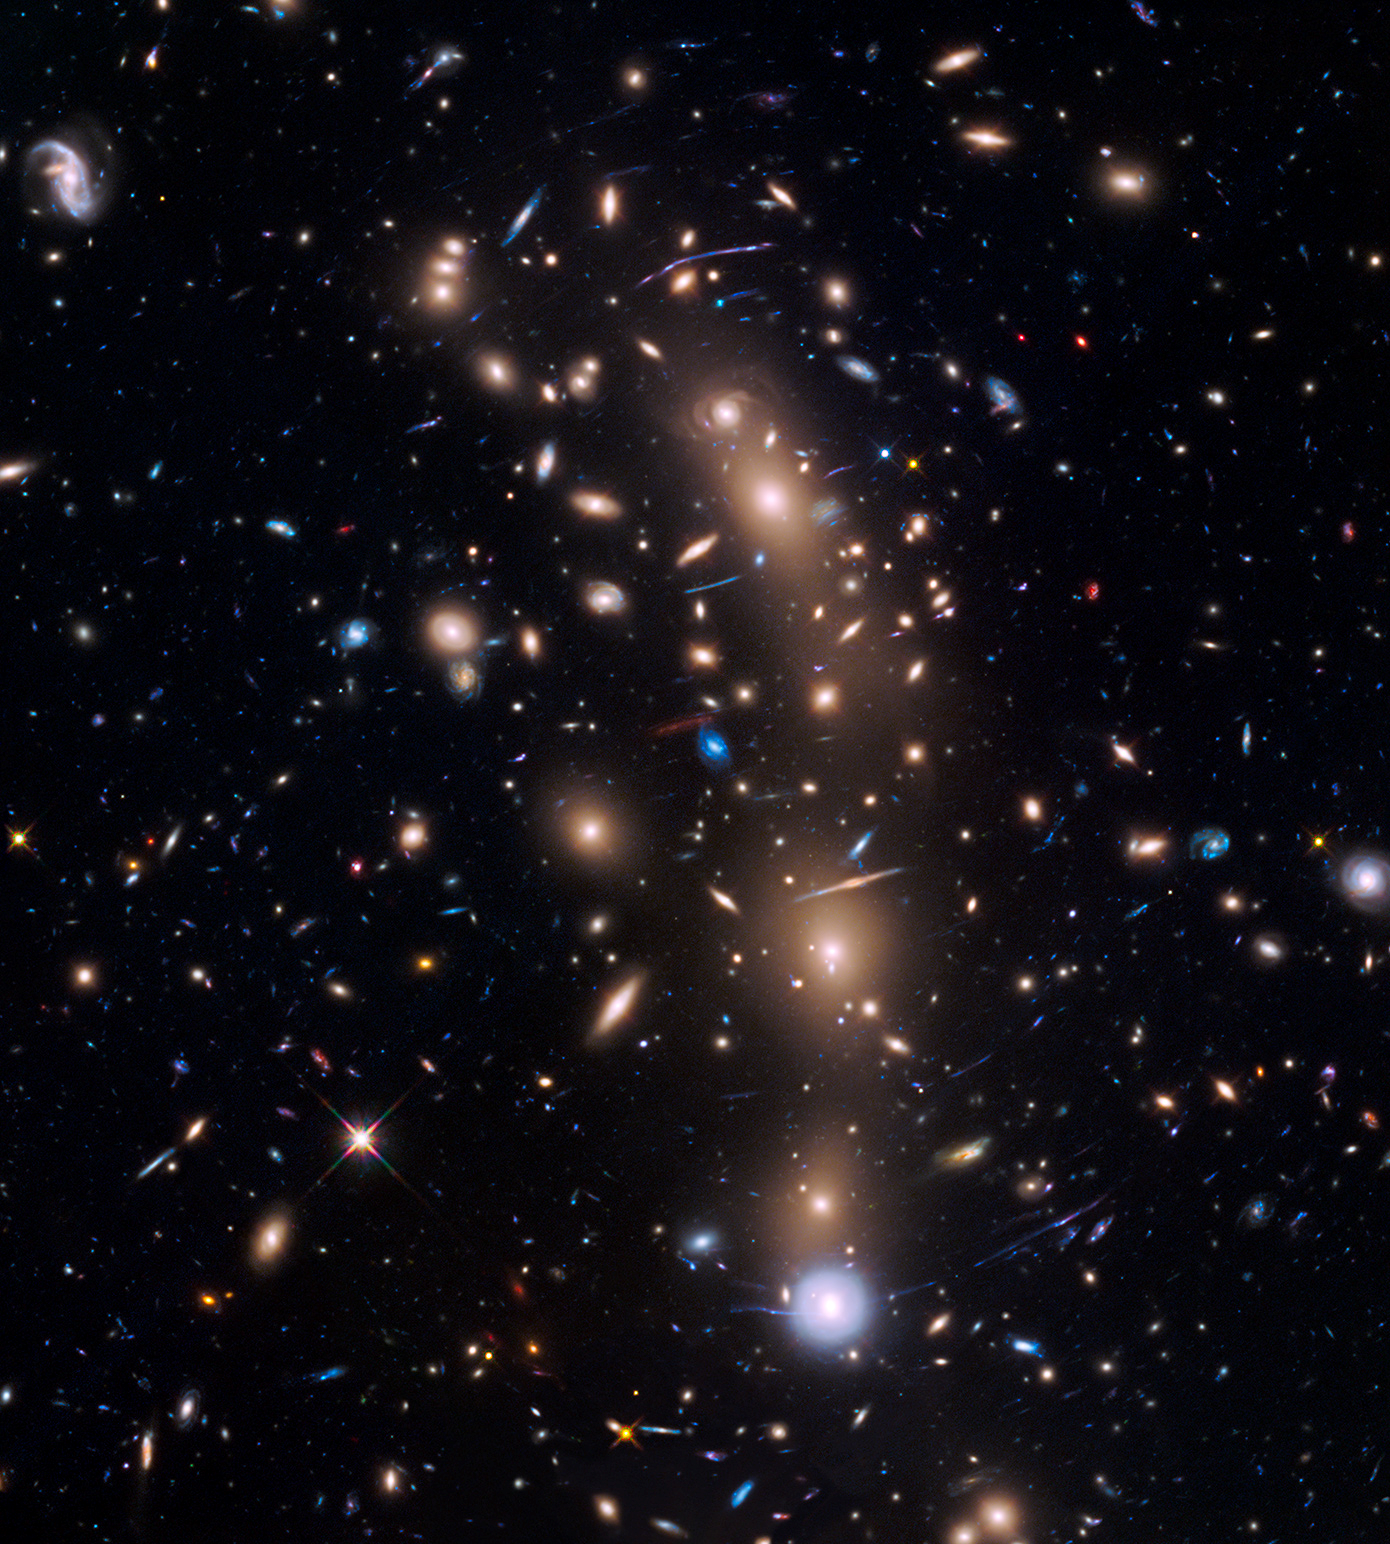 Molecular-Oxygen-Perceived-In-The-Closest-Quasar